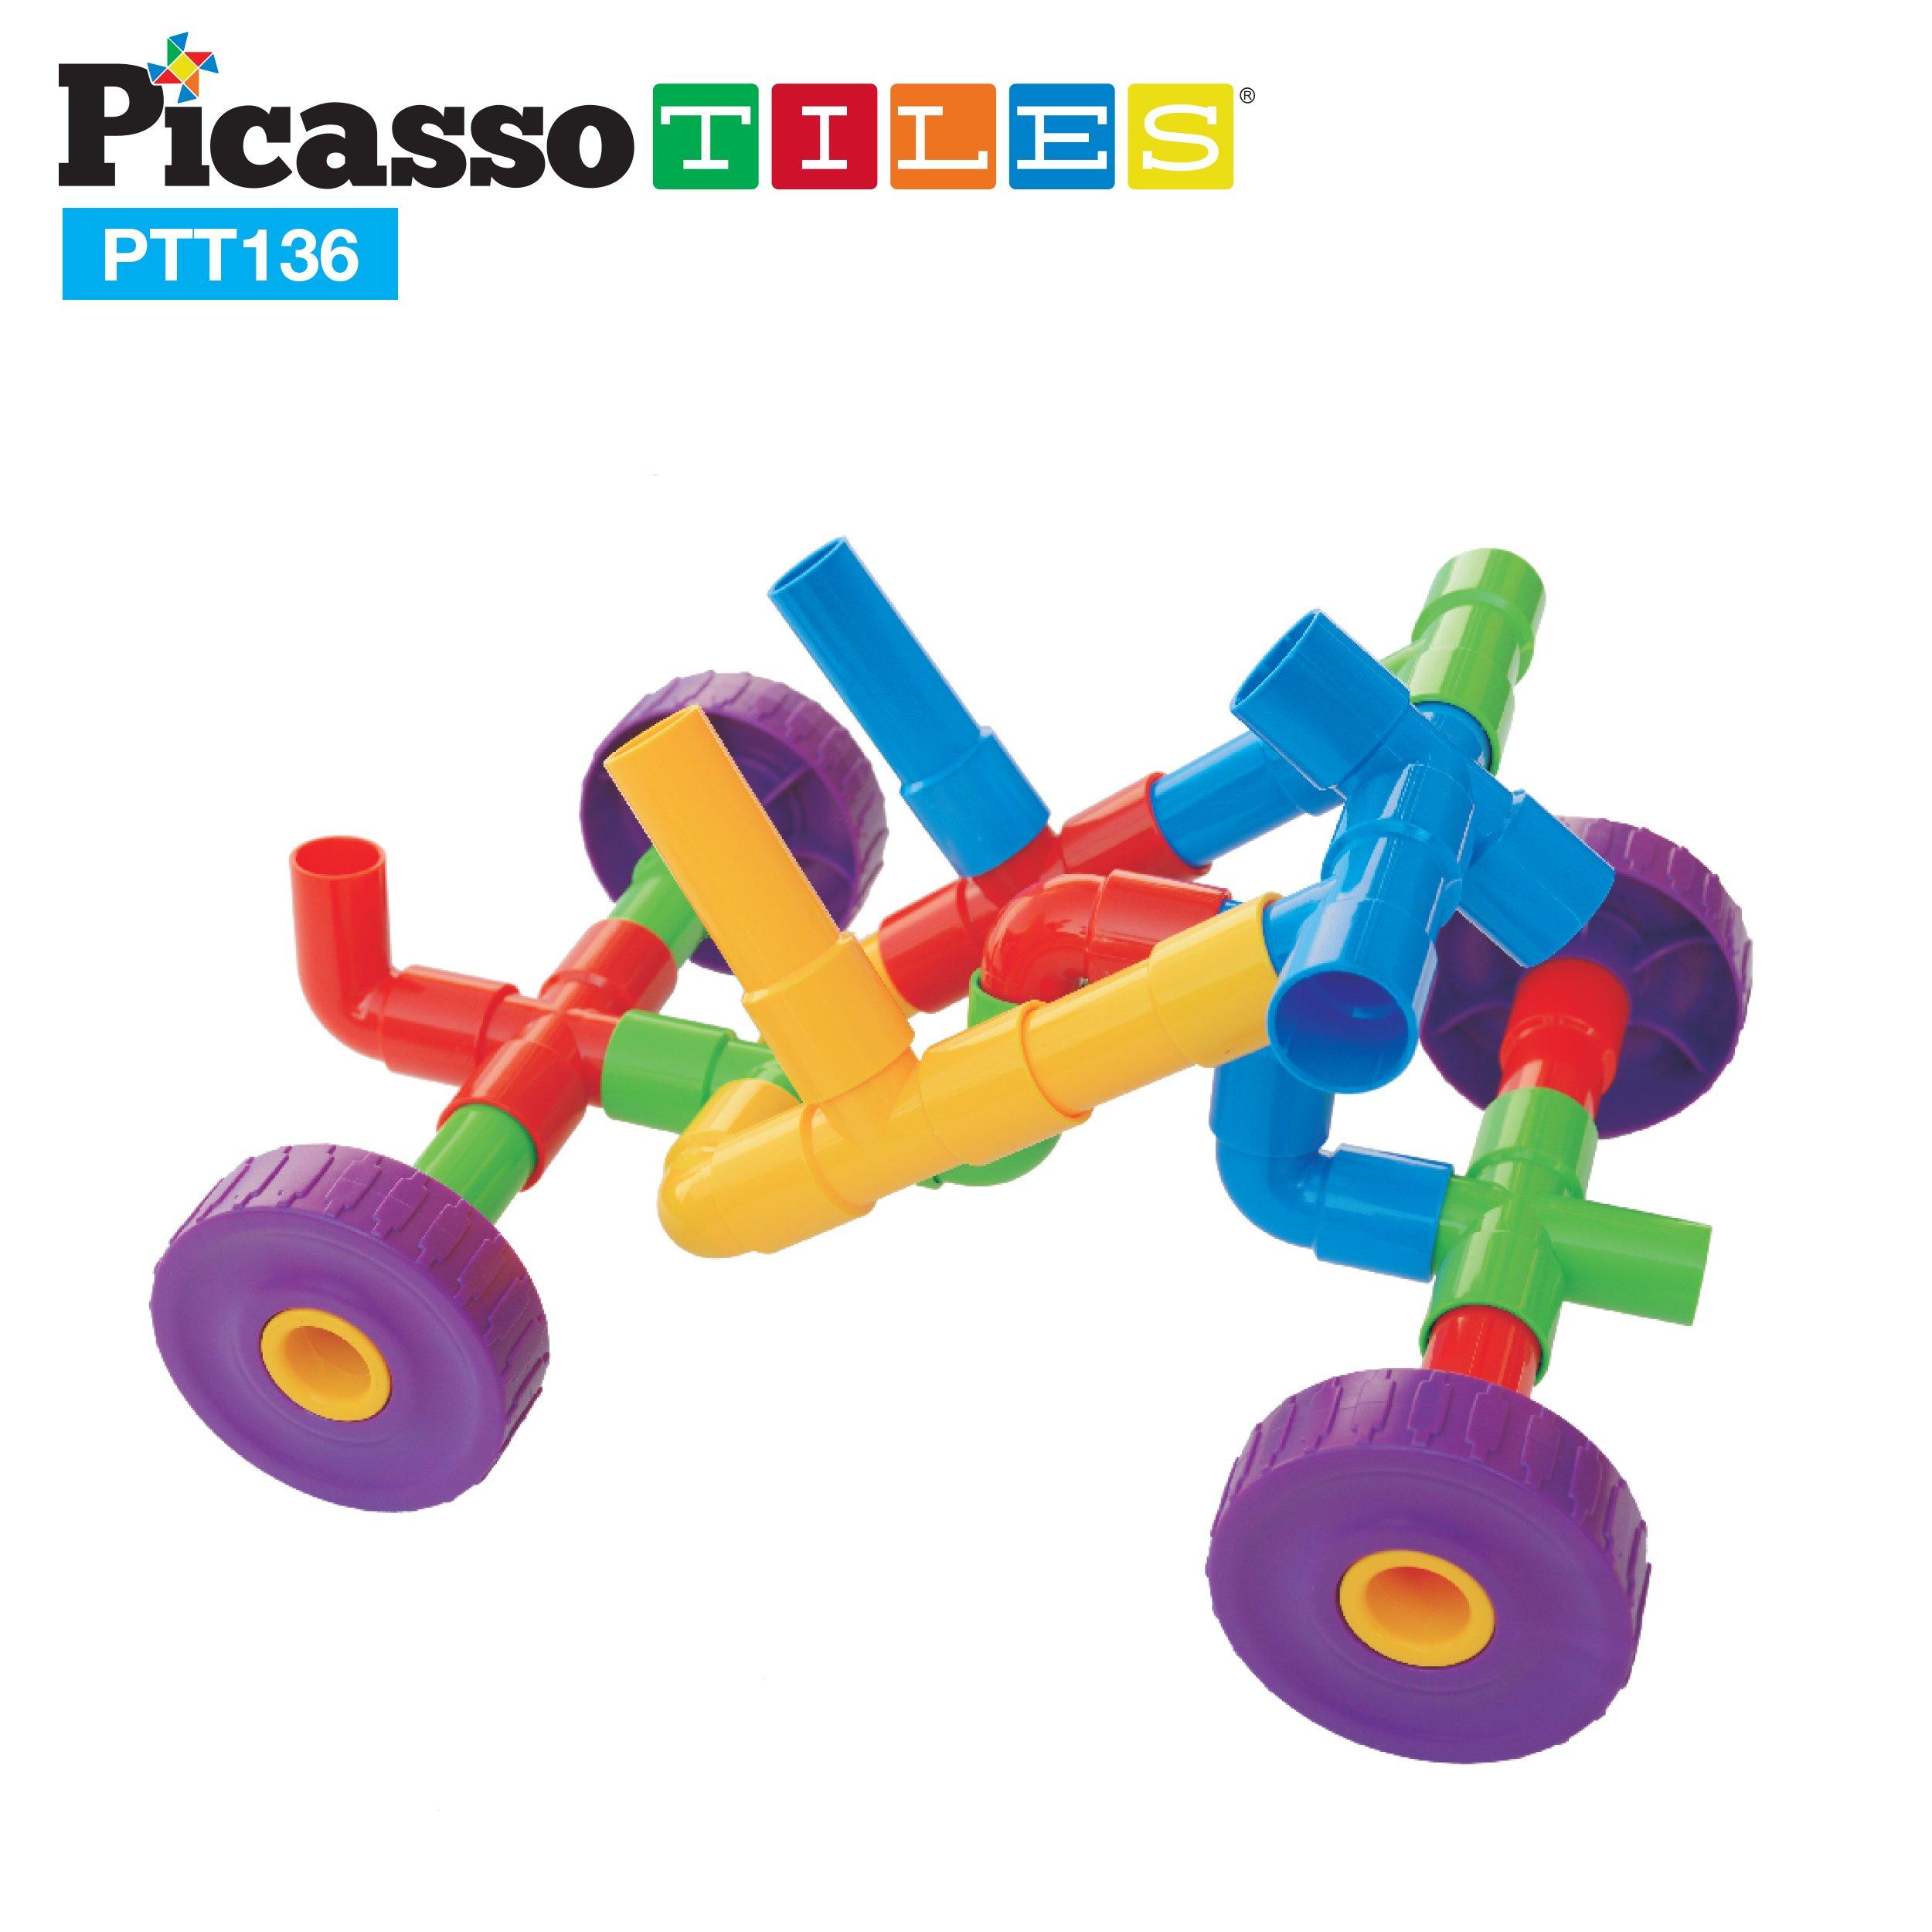 PicassoTiles® PTT136 136pcs Pipe Tube Wheel Building Set w/ Musical Kit, Storage Container Box, Pipeworks Construction STEM Interlocking Block Car Truck Motor Toy Assembling Puzzle Interlocking Flute